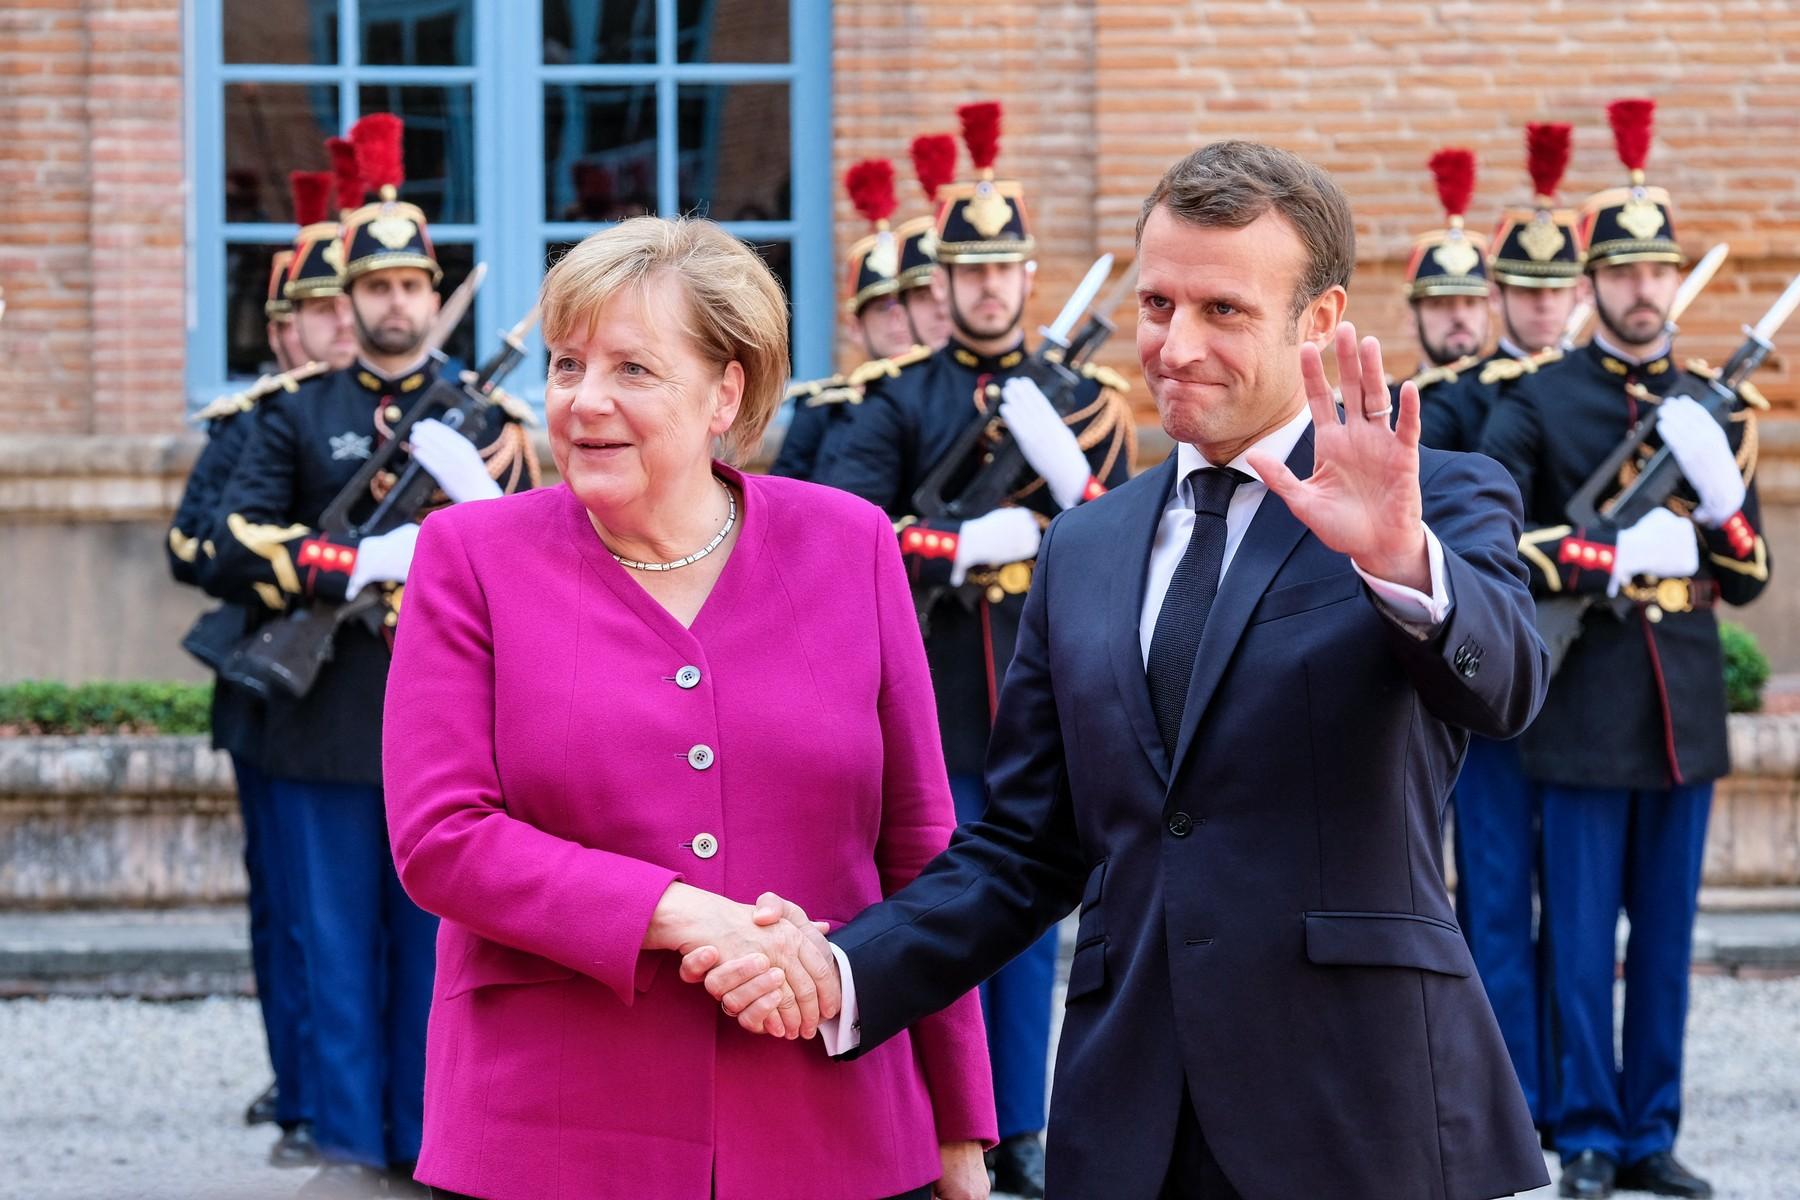 Francuski predsjednik Emmanuel Macron (desno) i njemačka kancelarka Angela Merkel